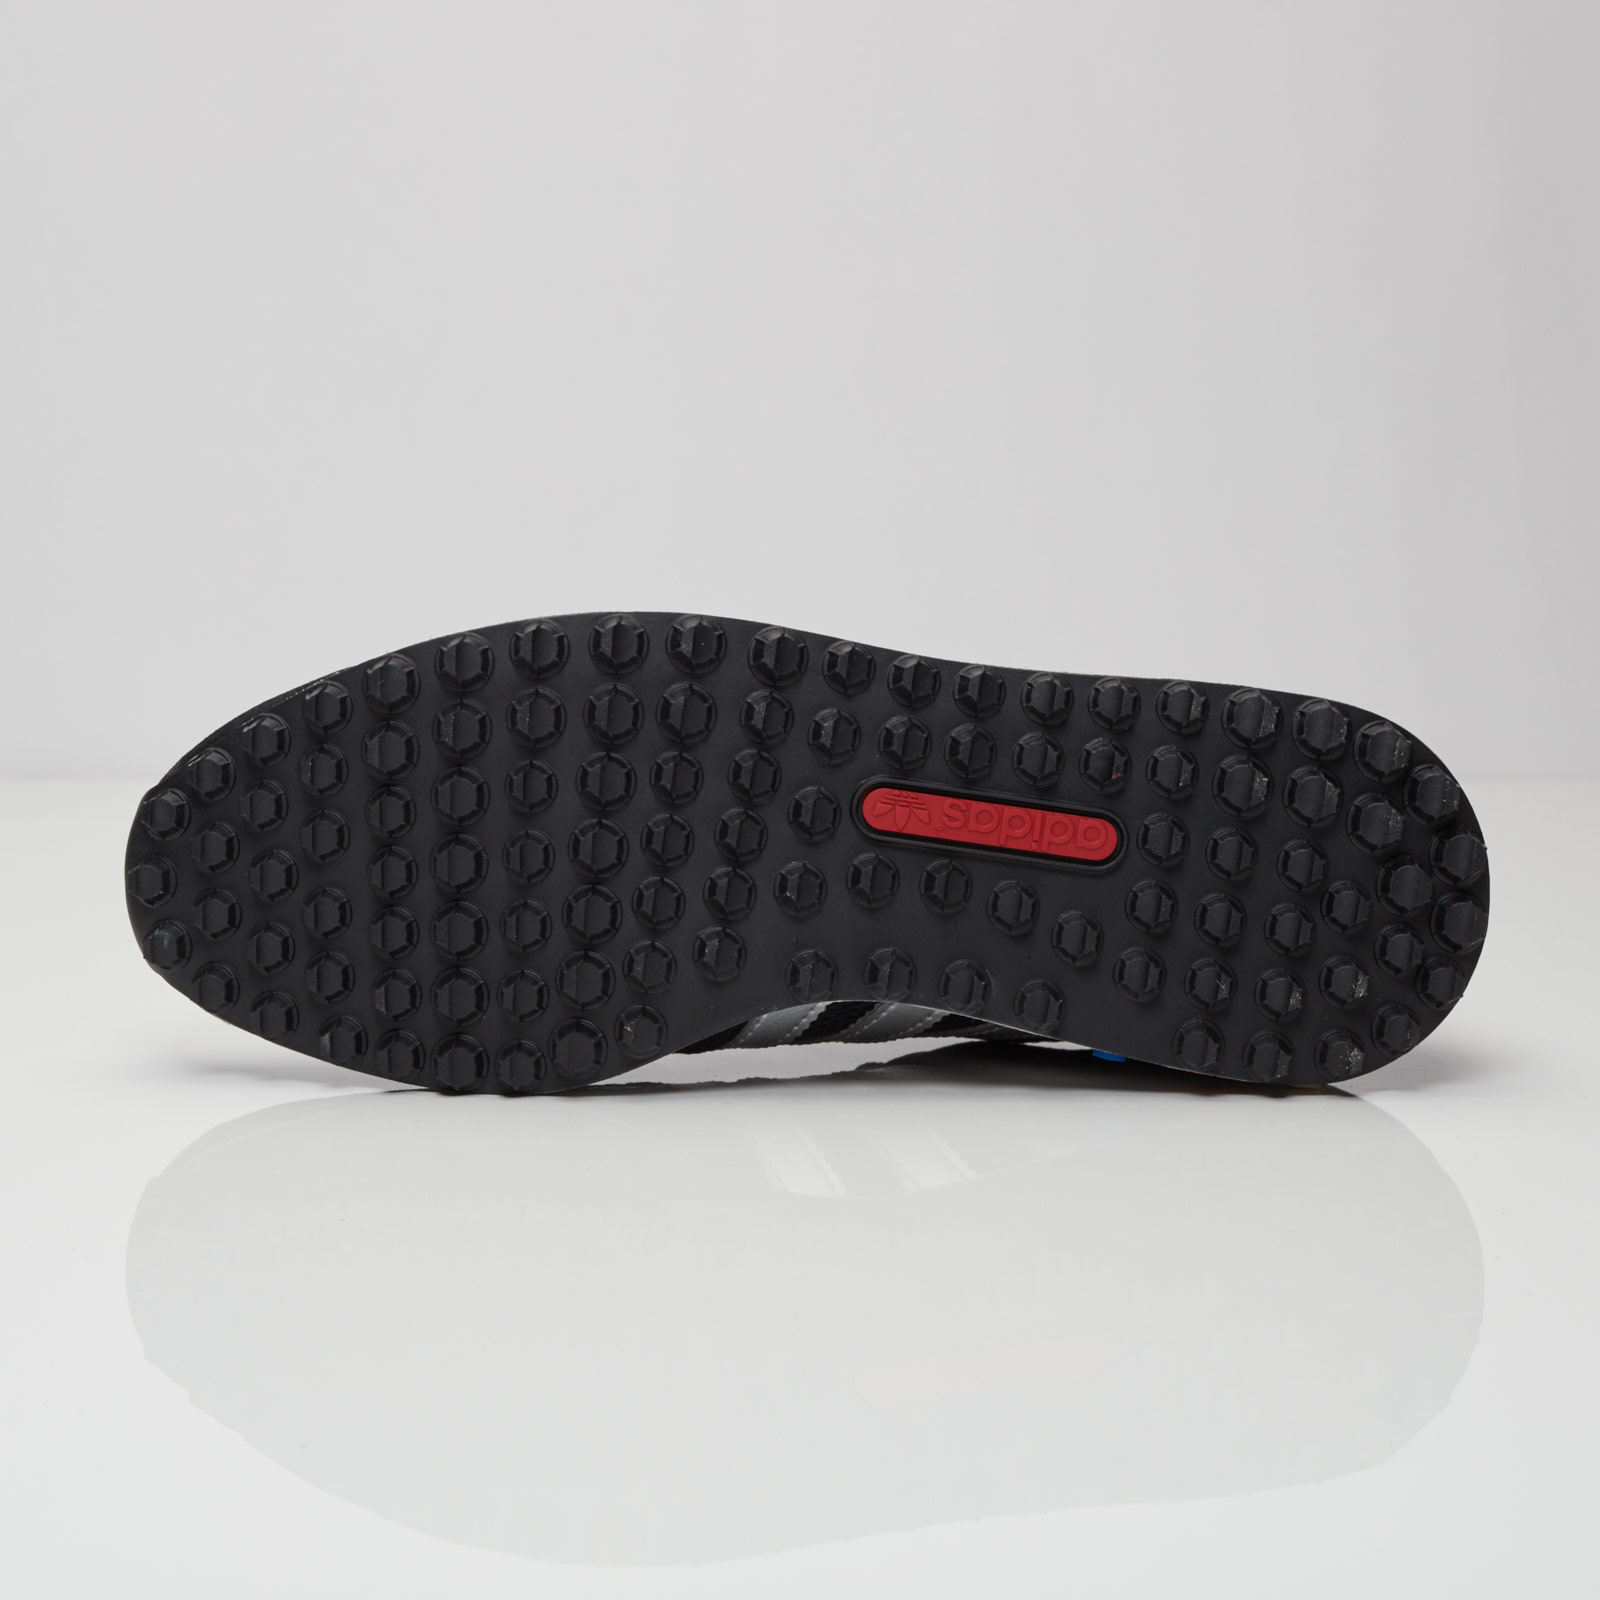 huge discount 8d453 febdb adidas LA Trainer OG MIG - Bb3774 - Sneakersnstuff   sneakers   streetwear  online since 1999